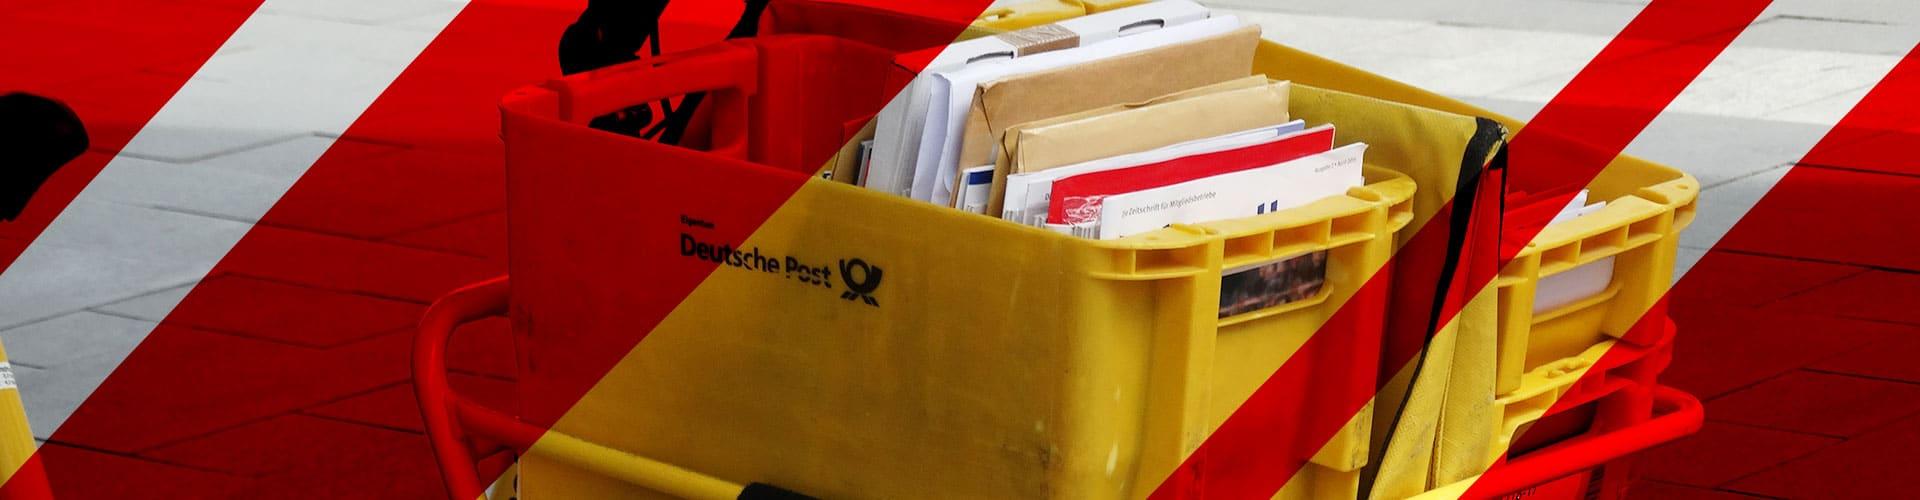 Poststreik